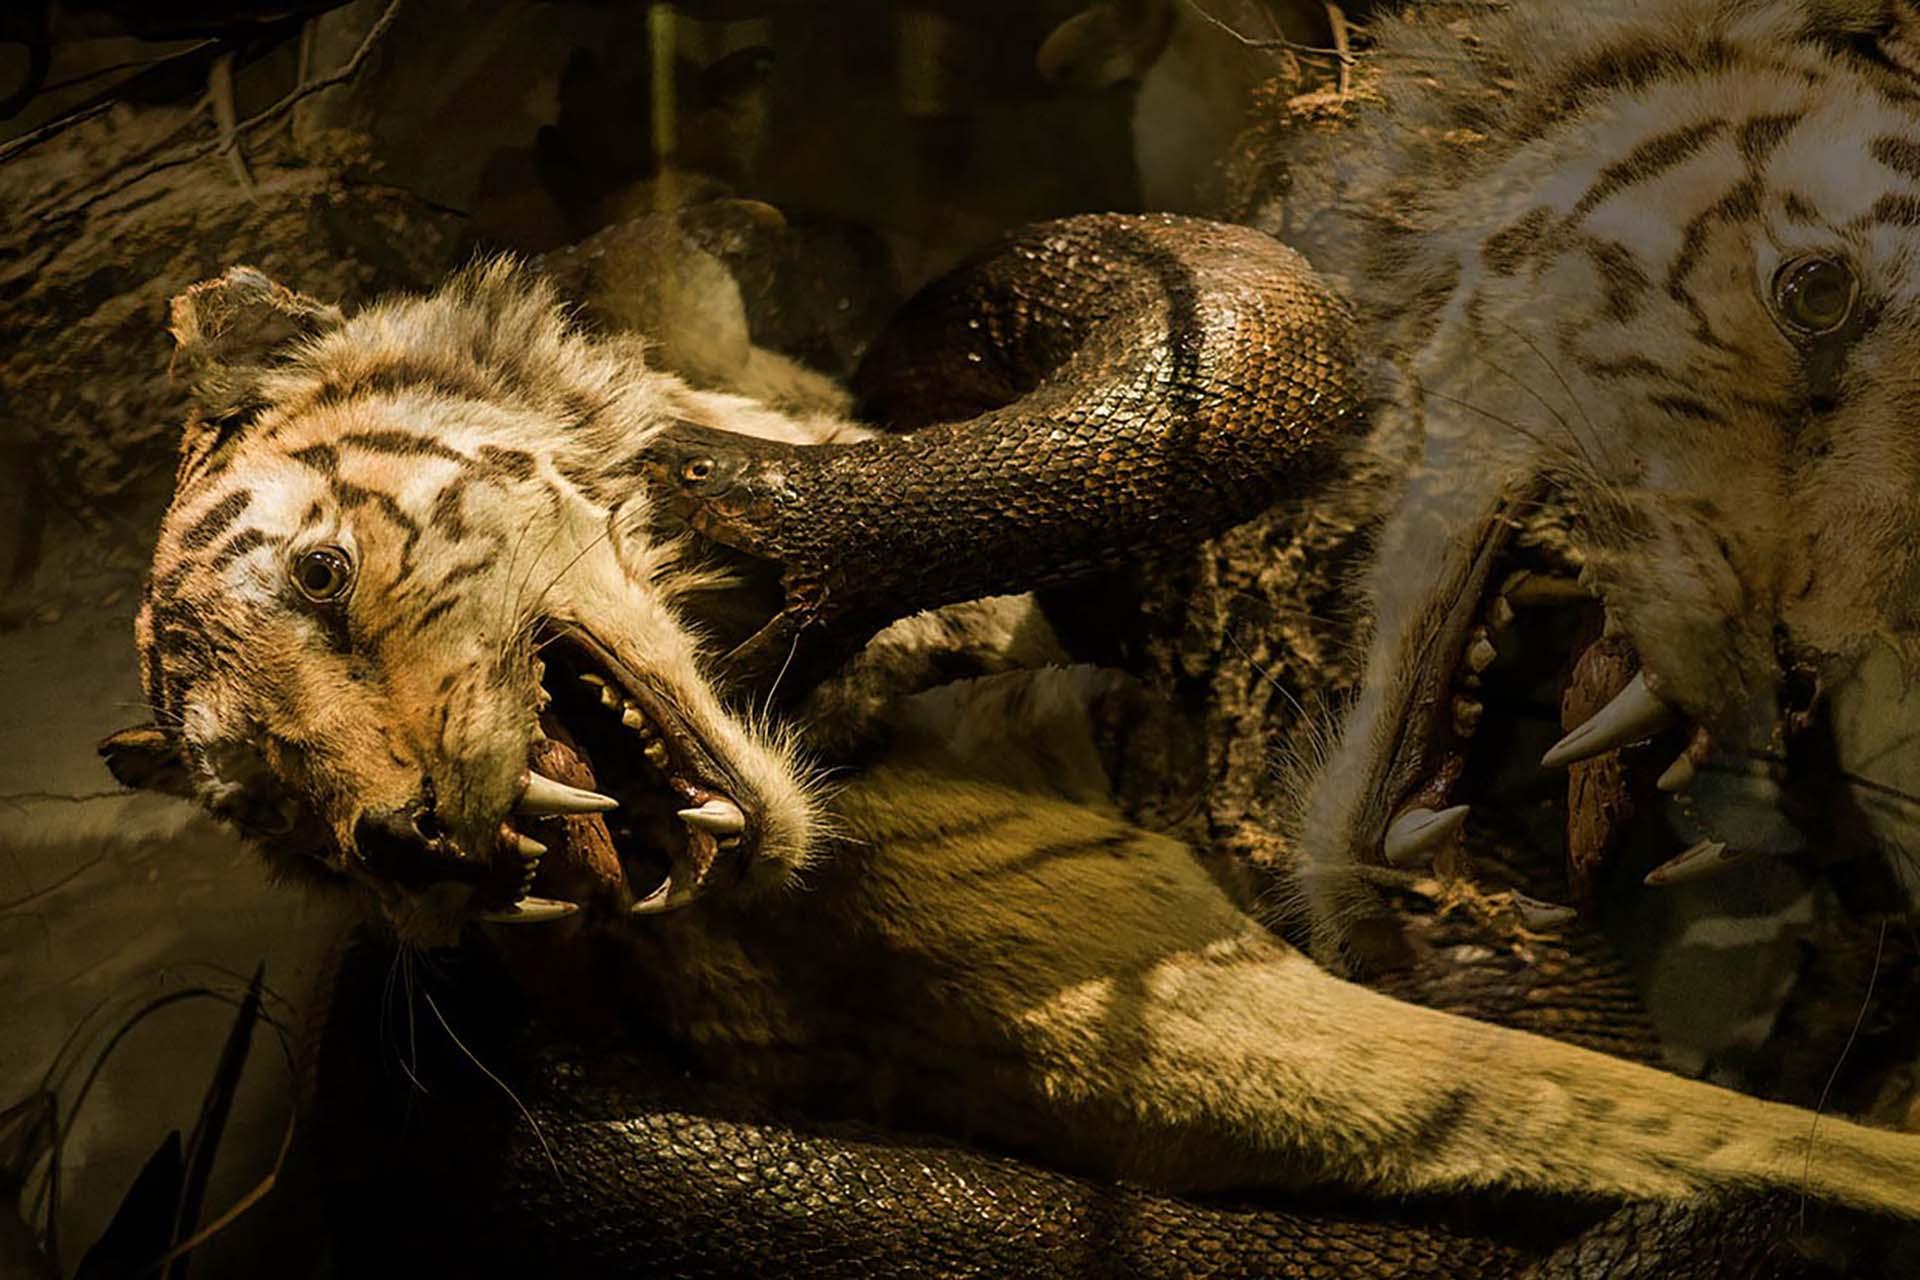 'Tiger & Python' Natural History Exhibit